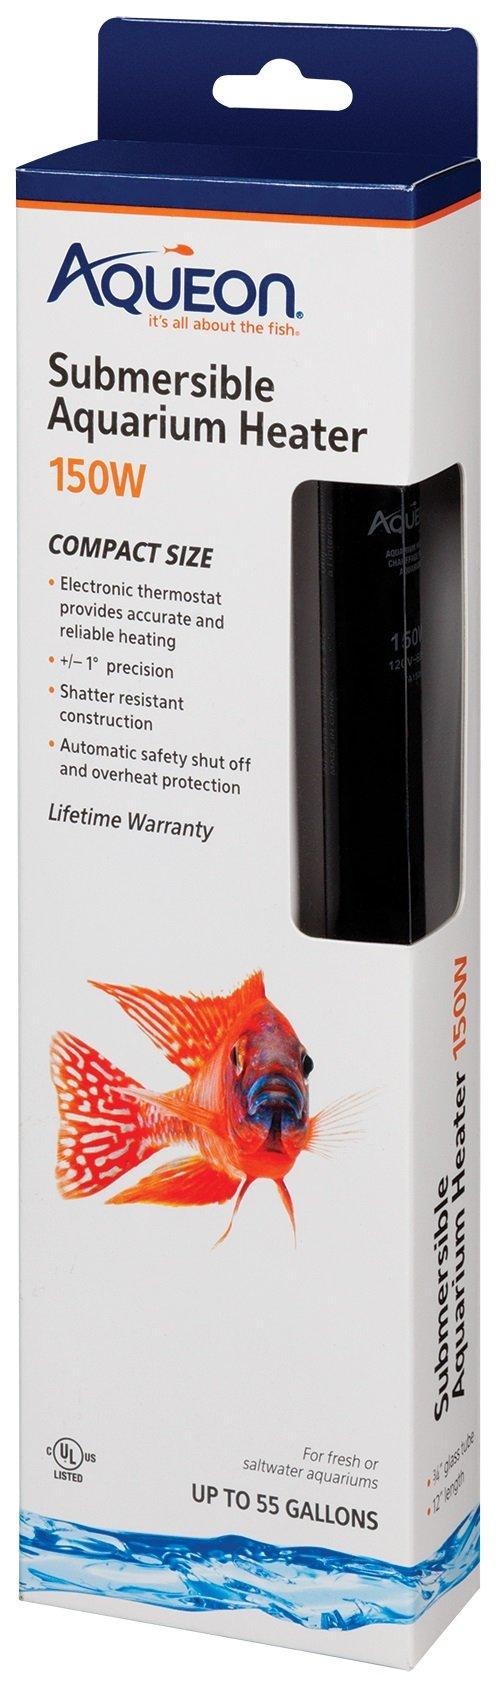 Aqueon Submersible Aquarium Heater 150 Watt